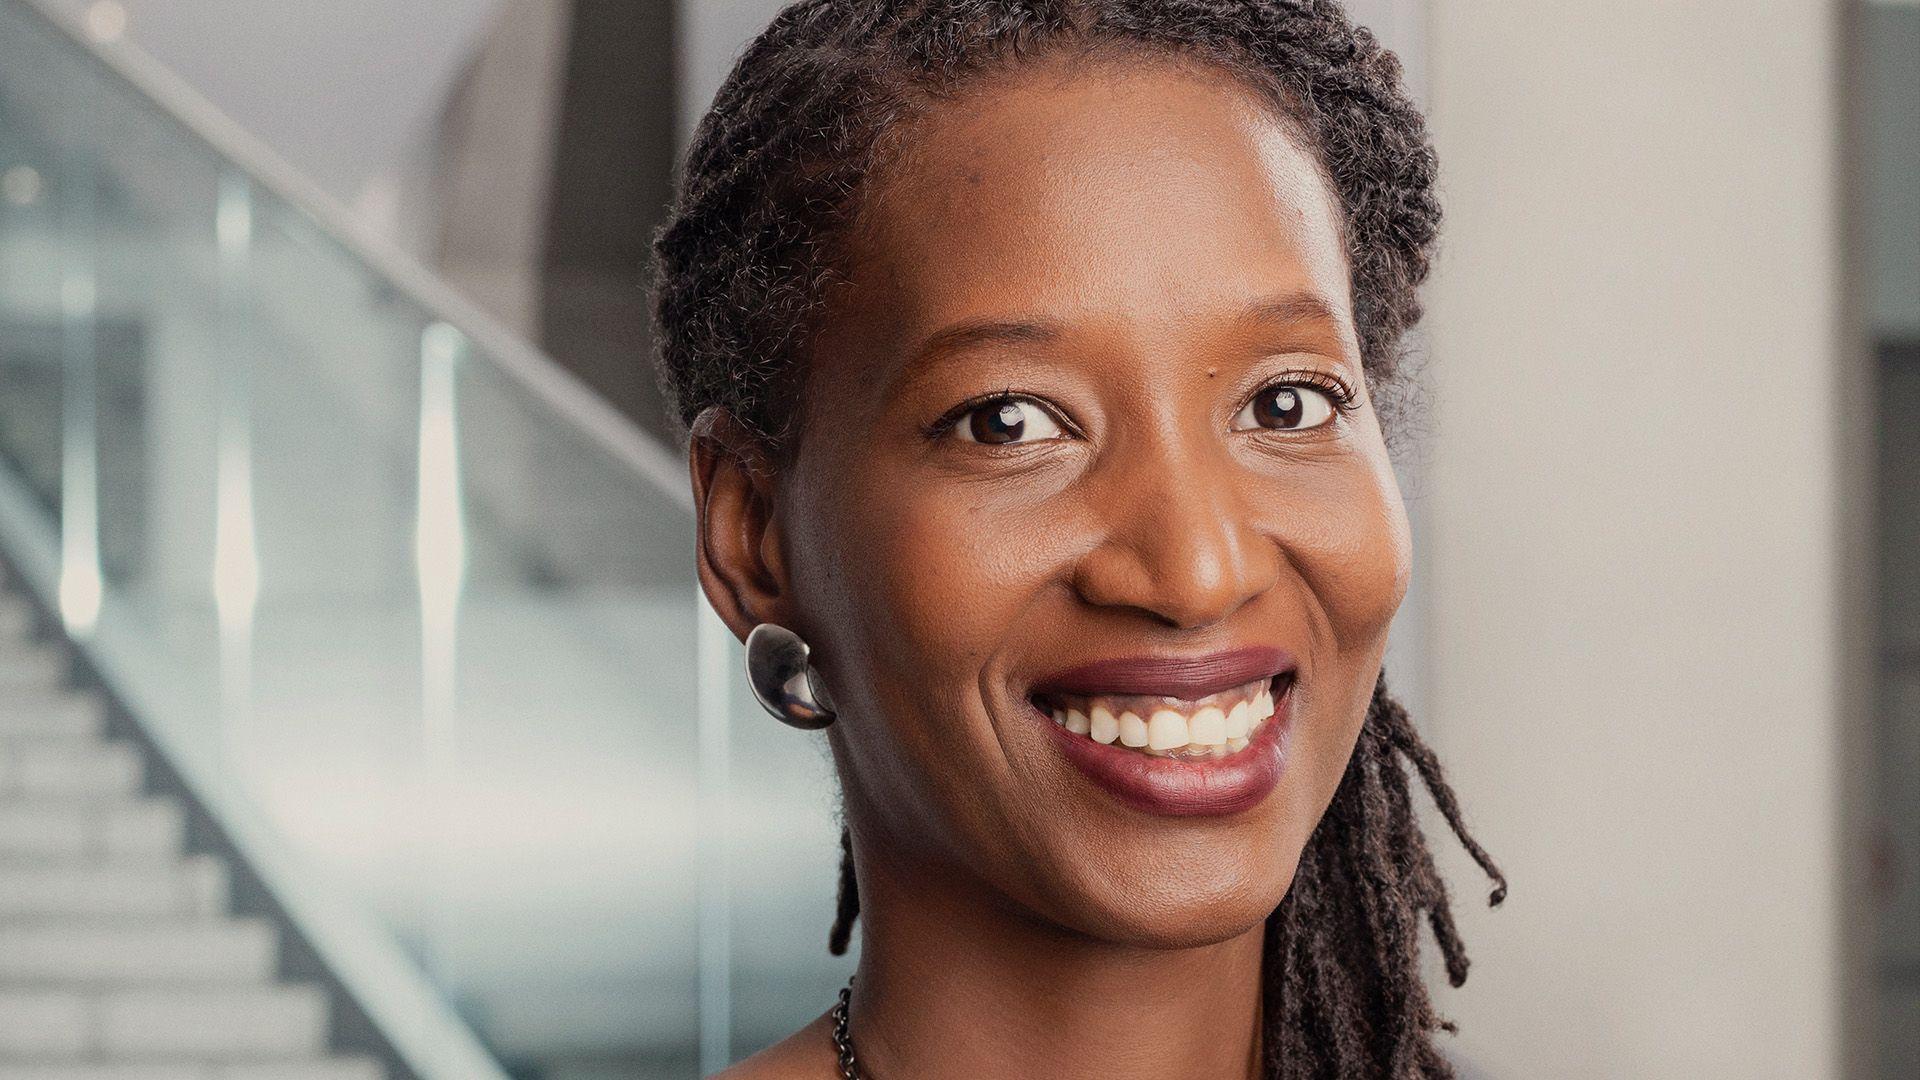 Safiatou, donatrice depuis 2019